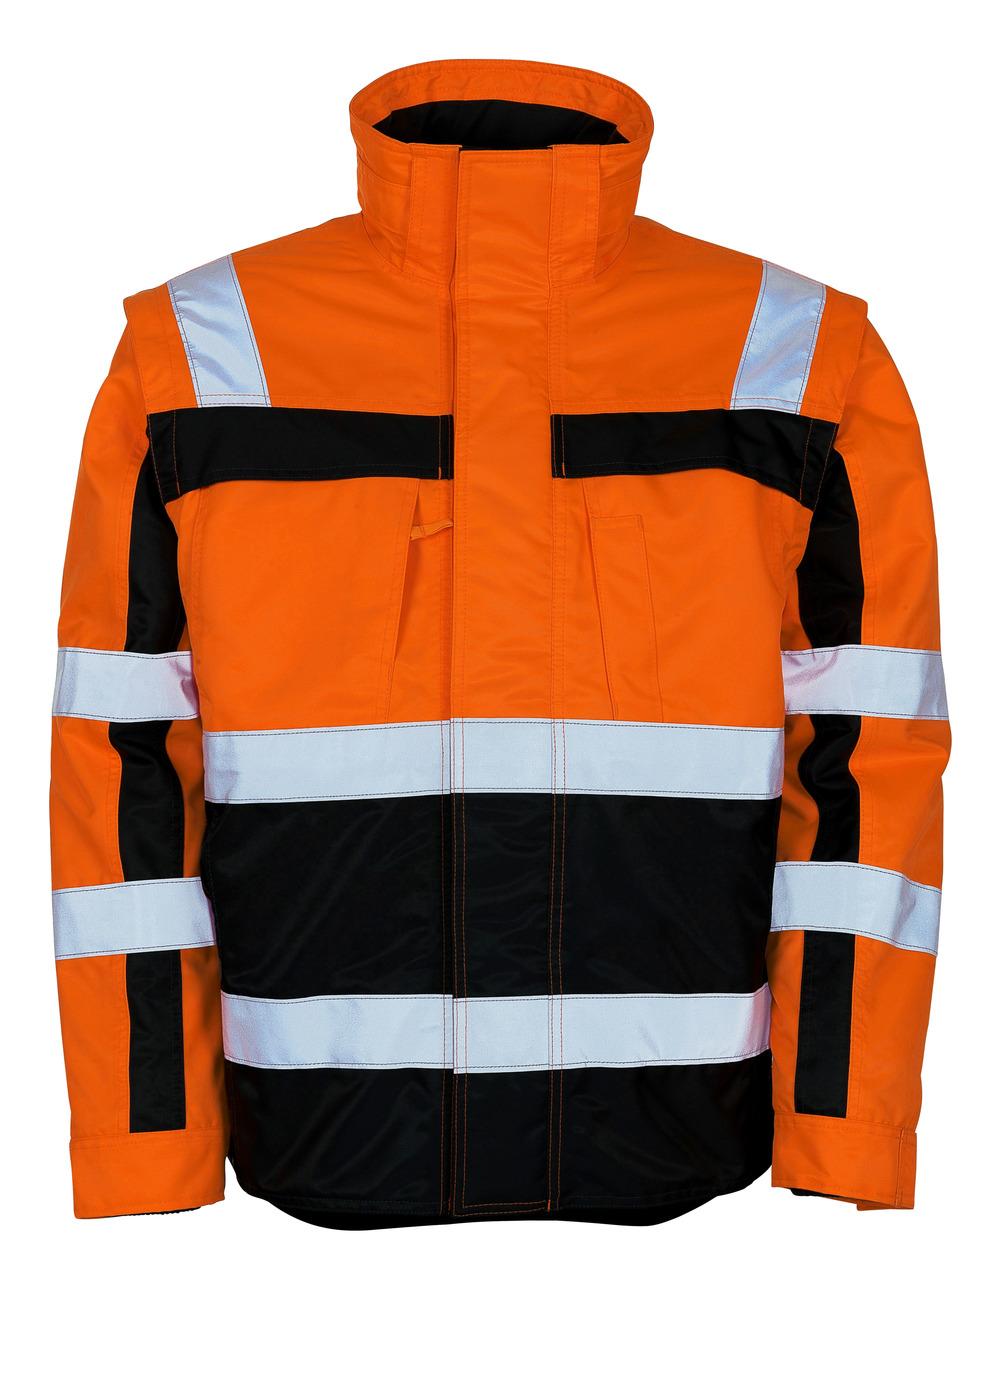 09335-880-141 Vinterjakke - hi-vis oransje/marine